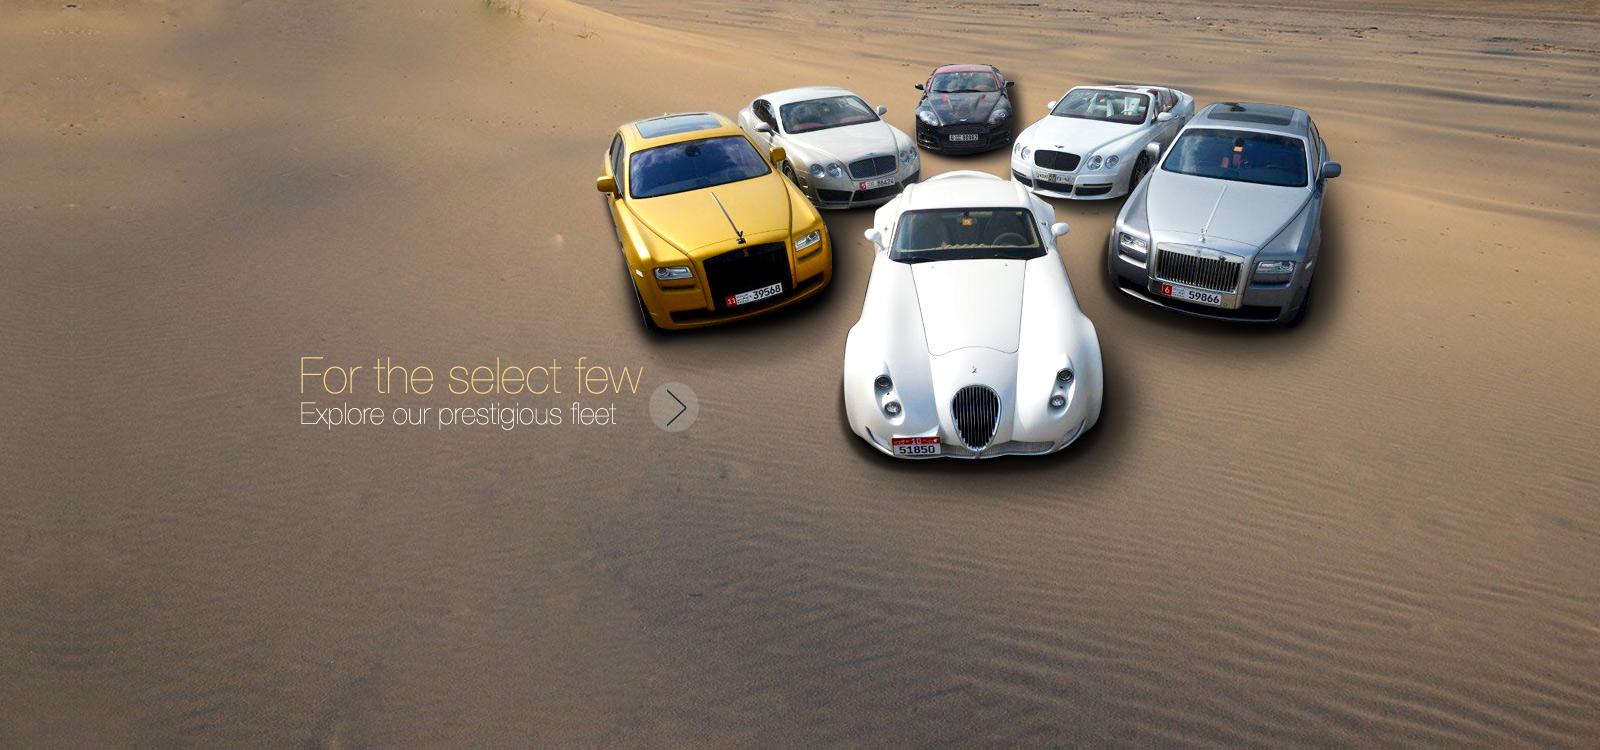 Luxury Car Rental Abu Dhabi, Dubai, Al Ain, Sharjah